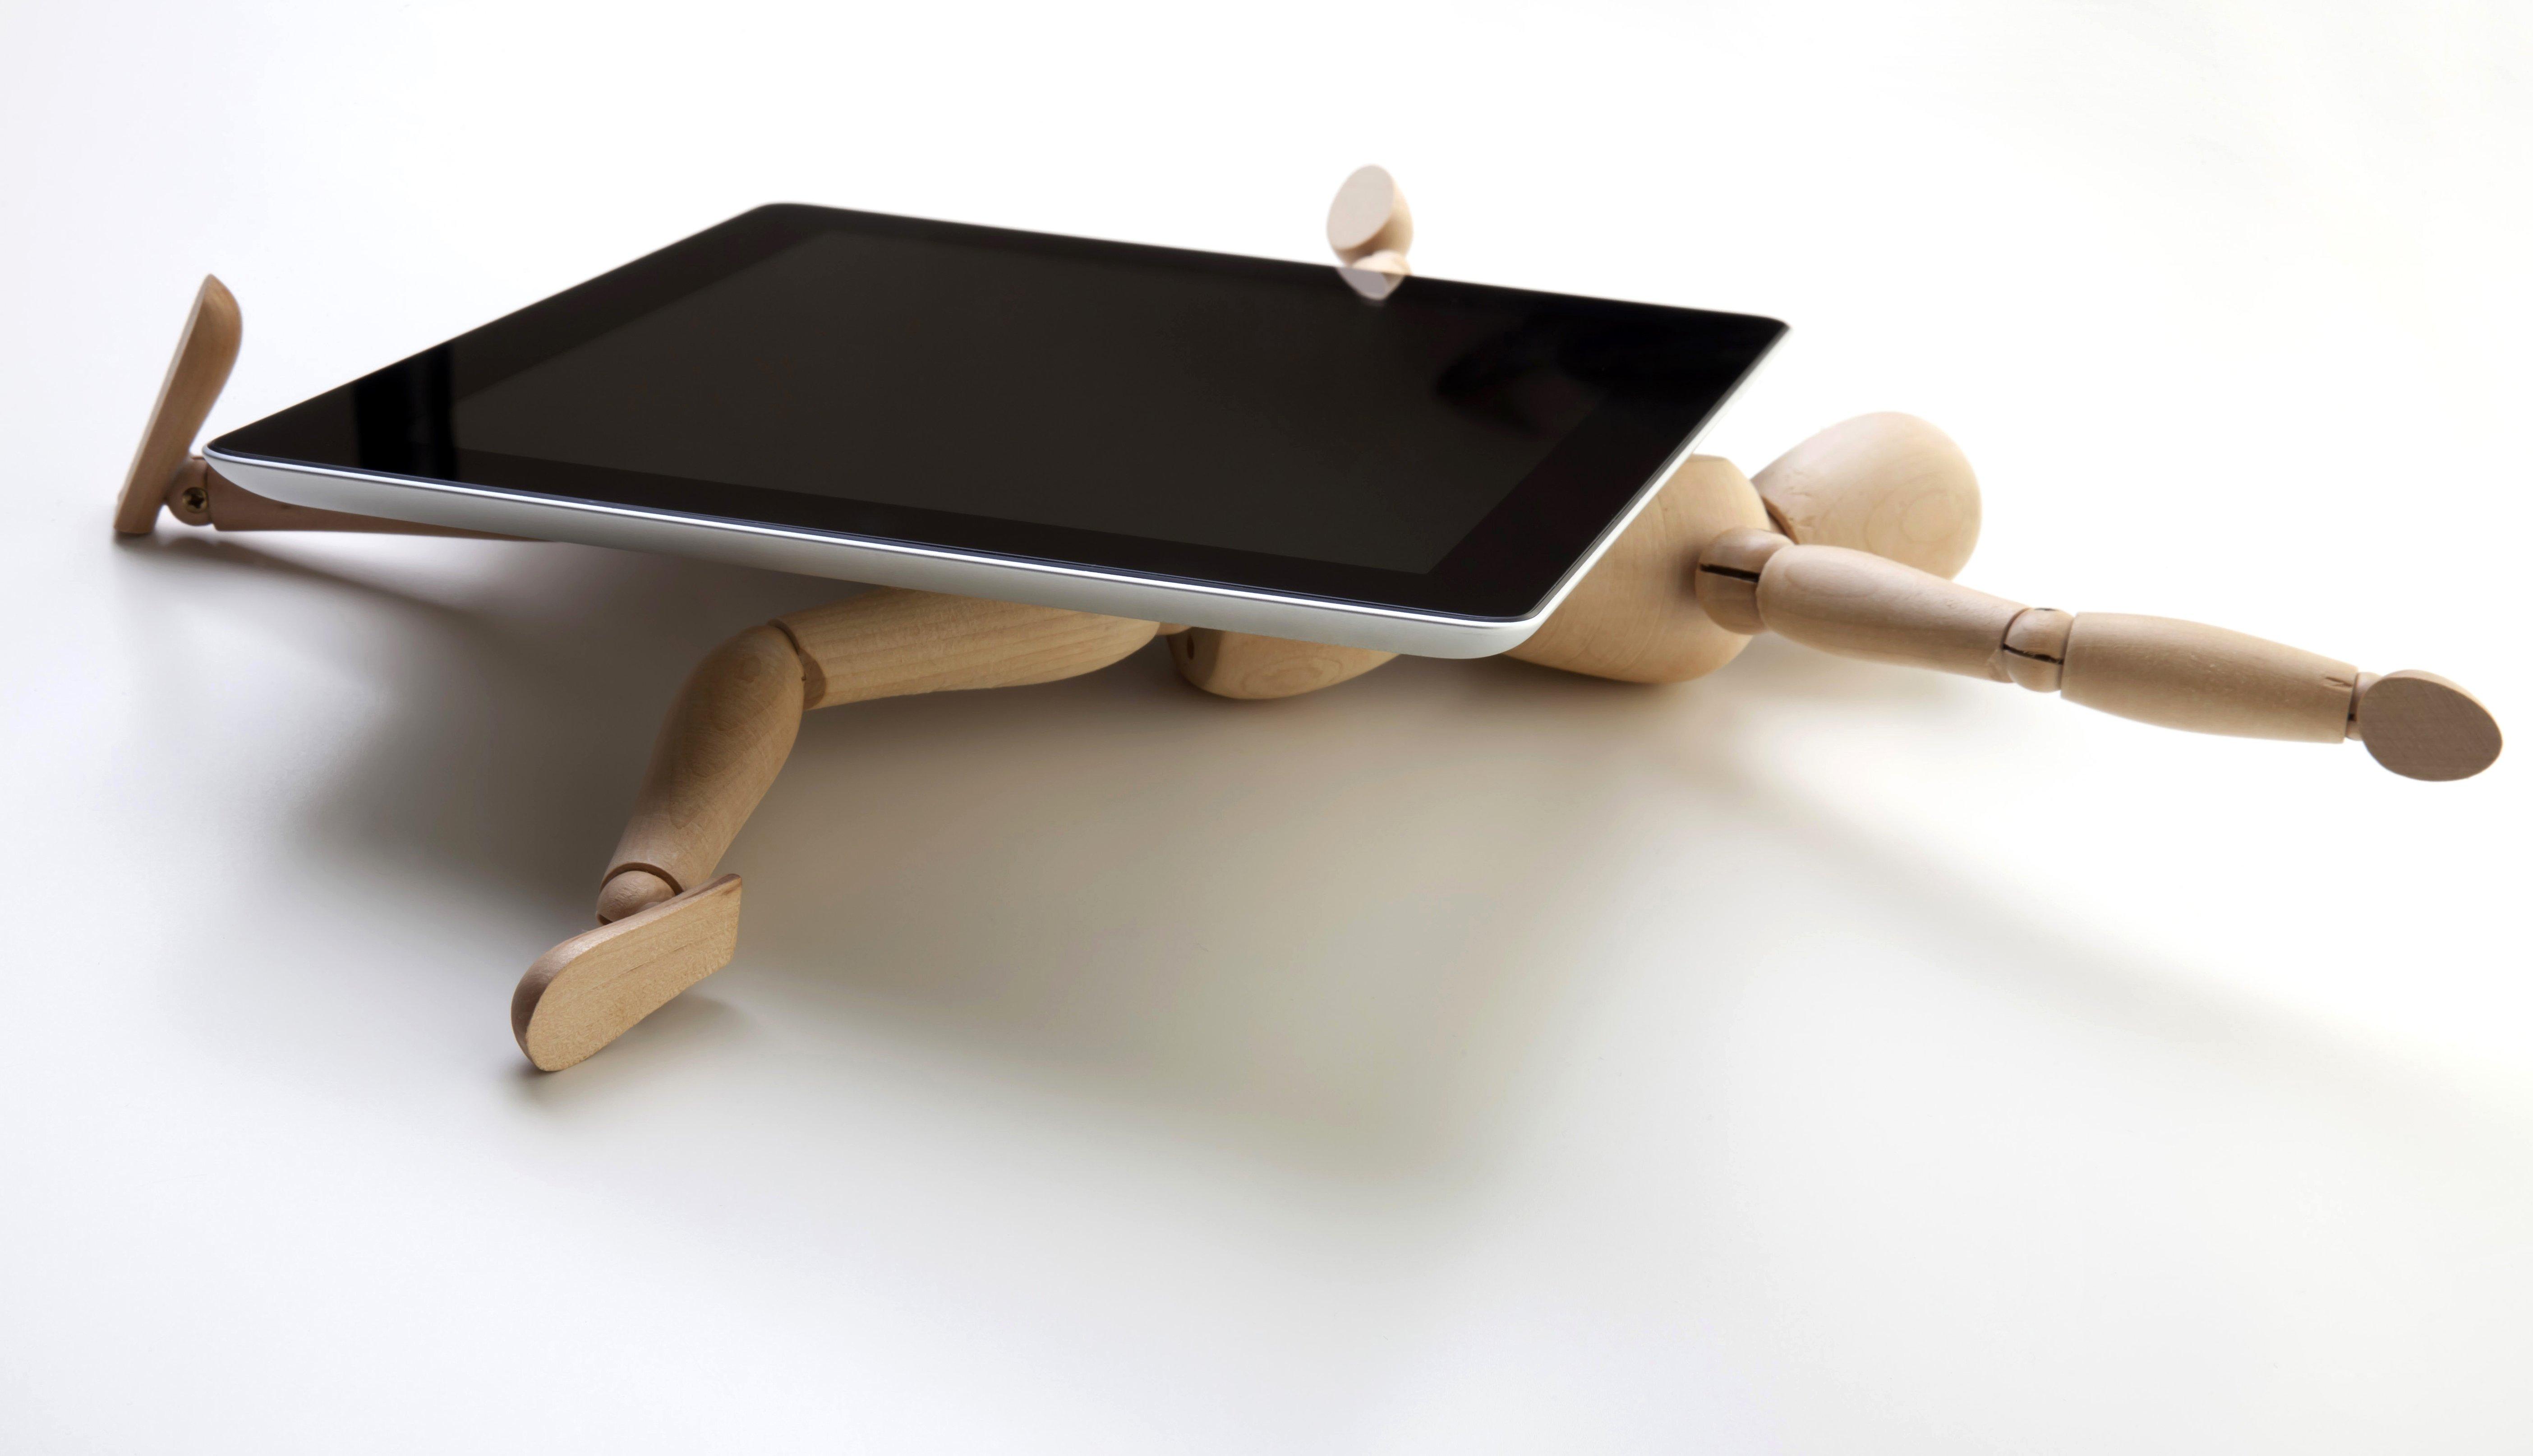 Muñeco aplastado por una tableta